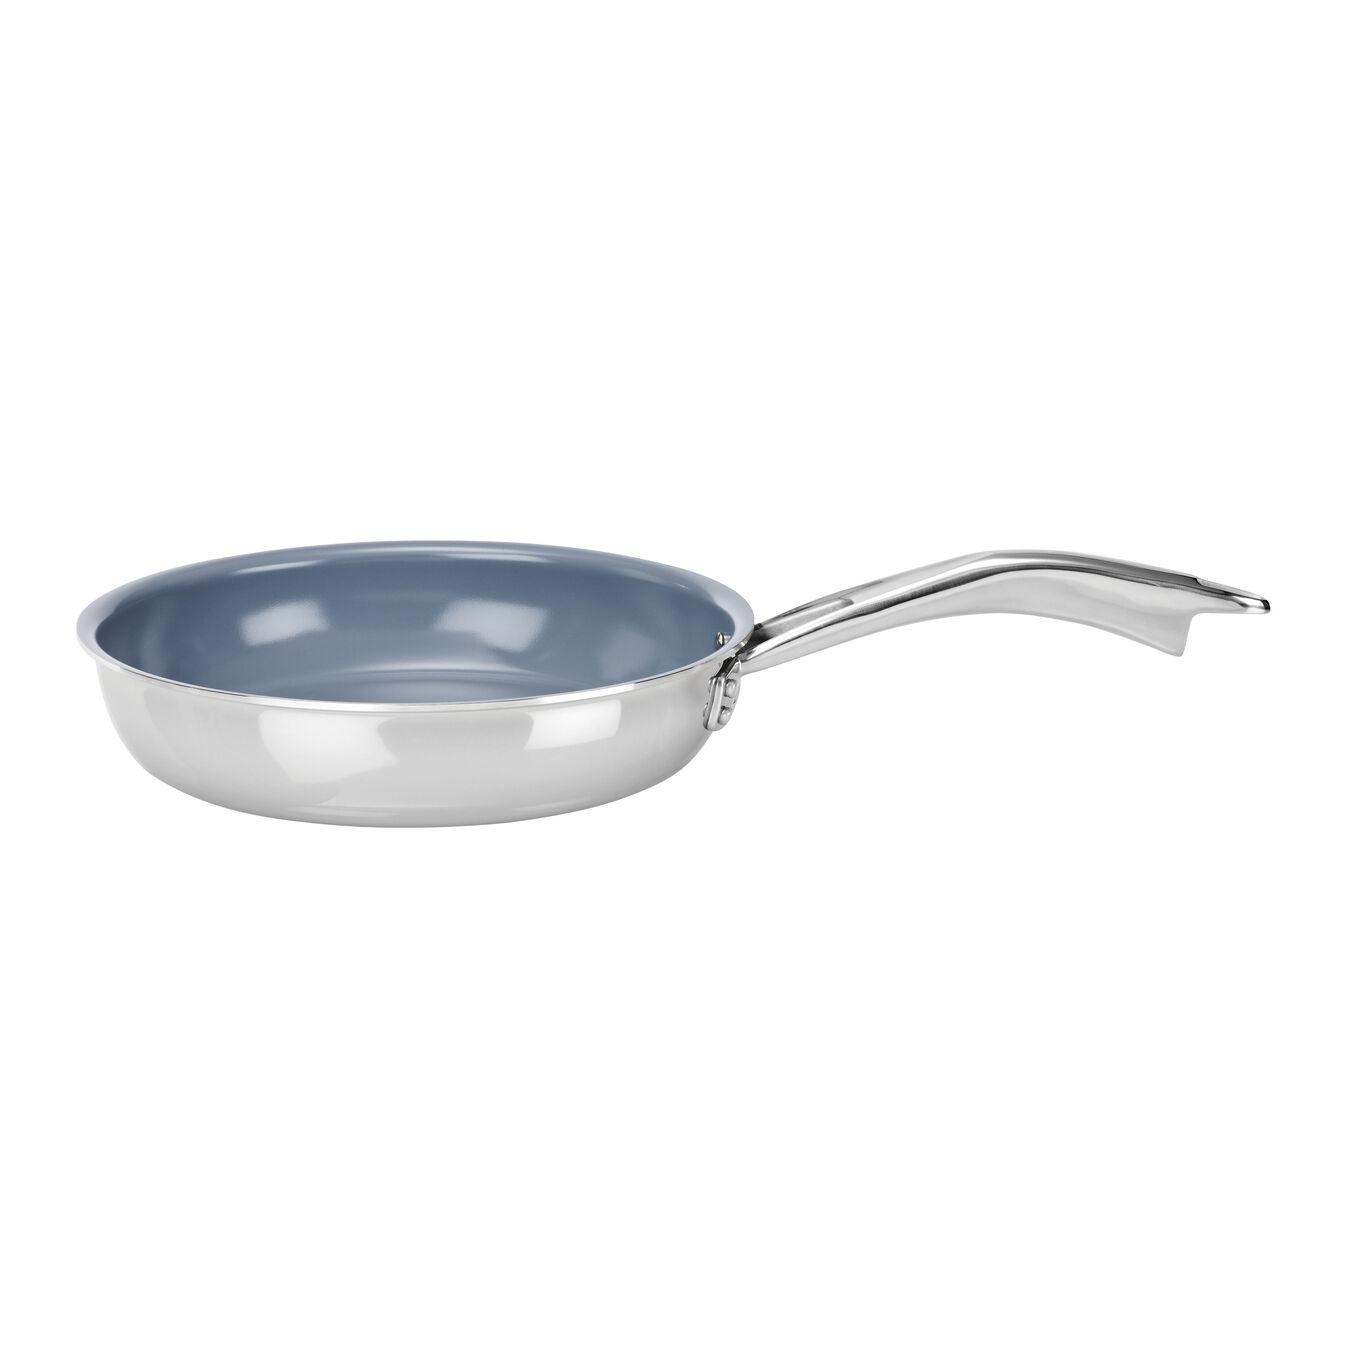 26 cm / 10 inch Frying pan,,large 1